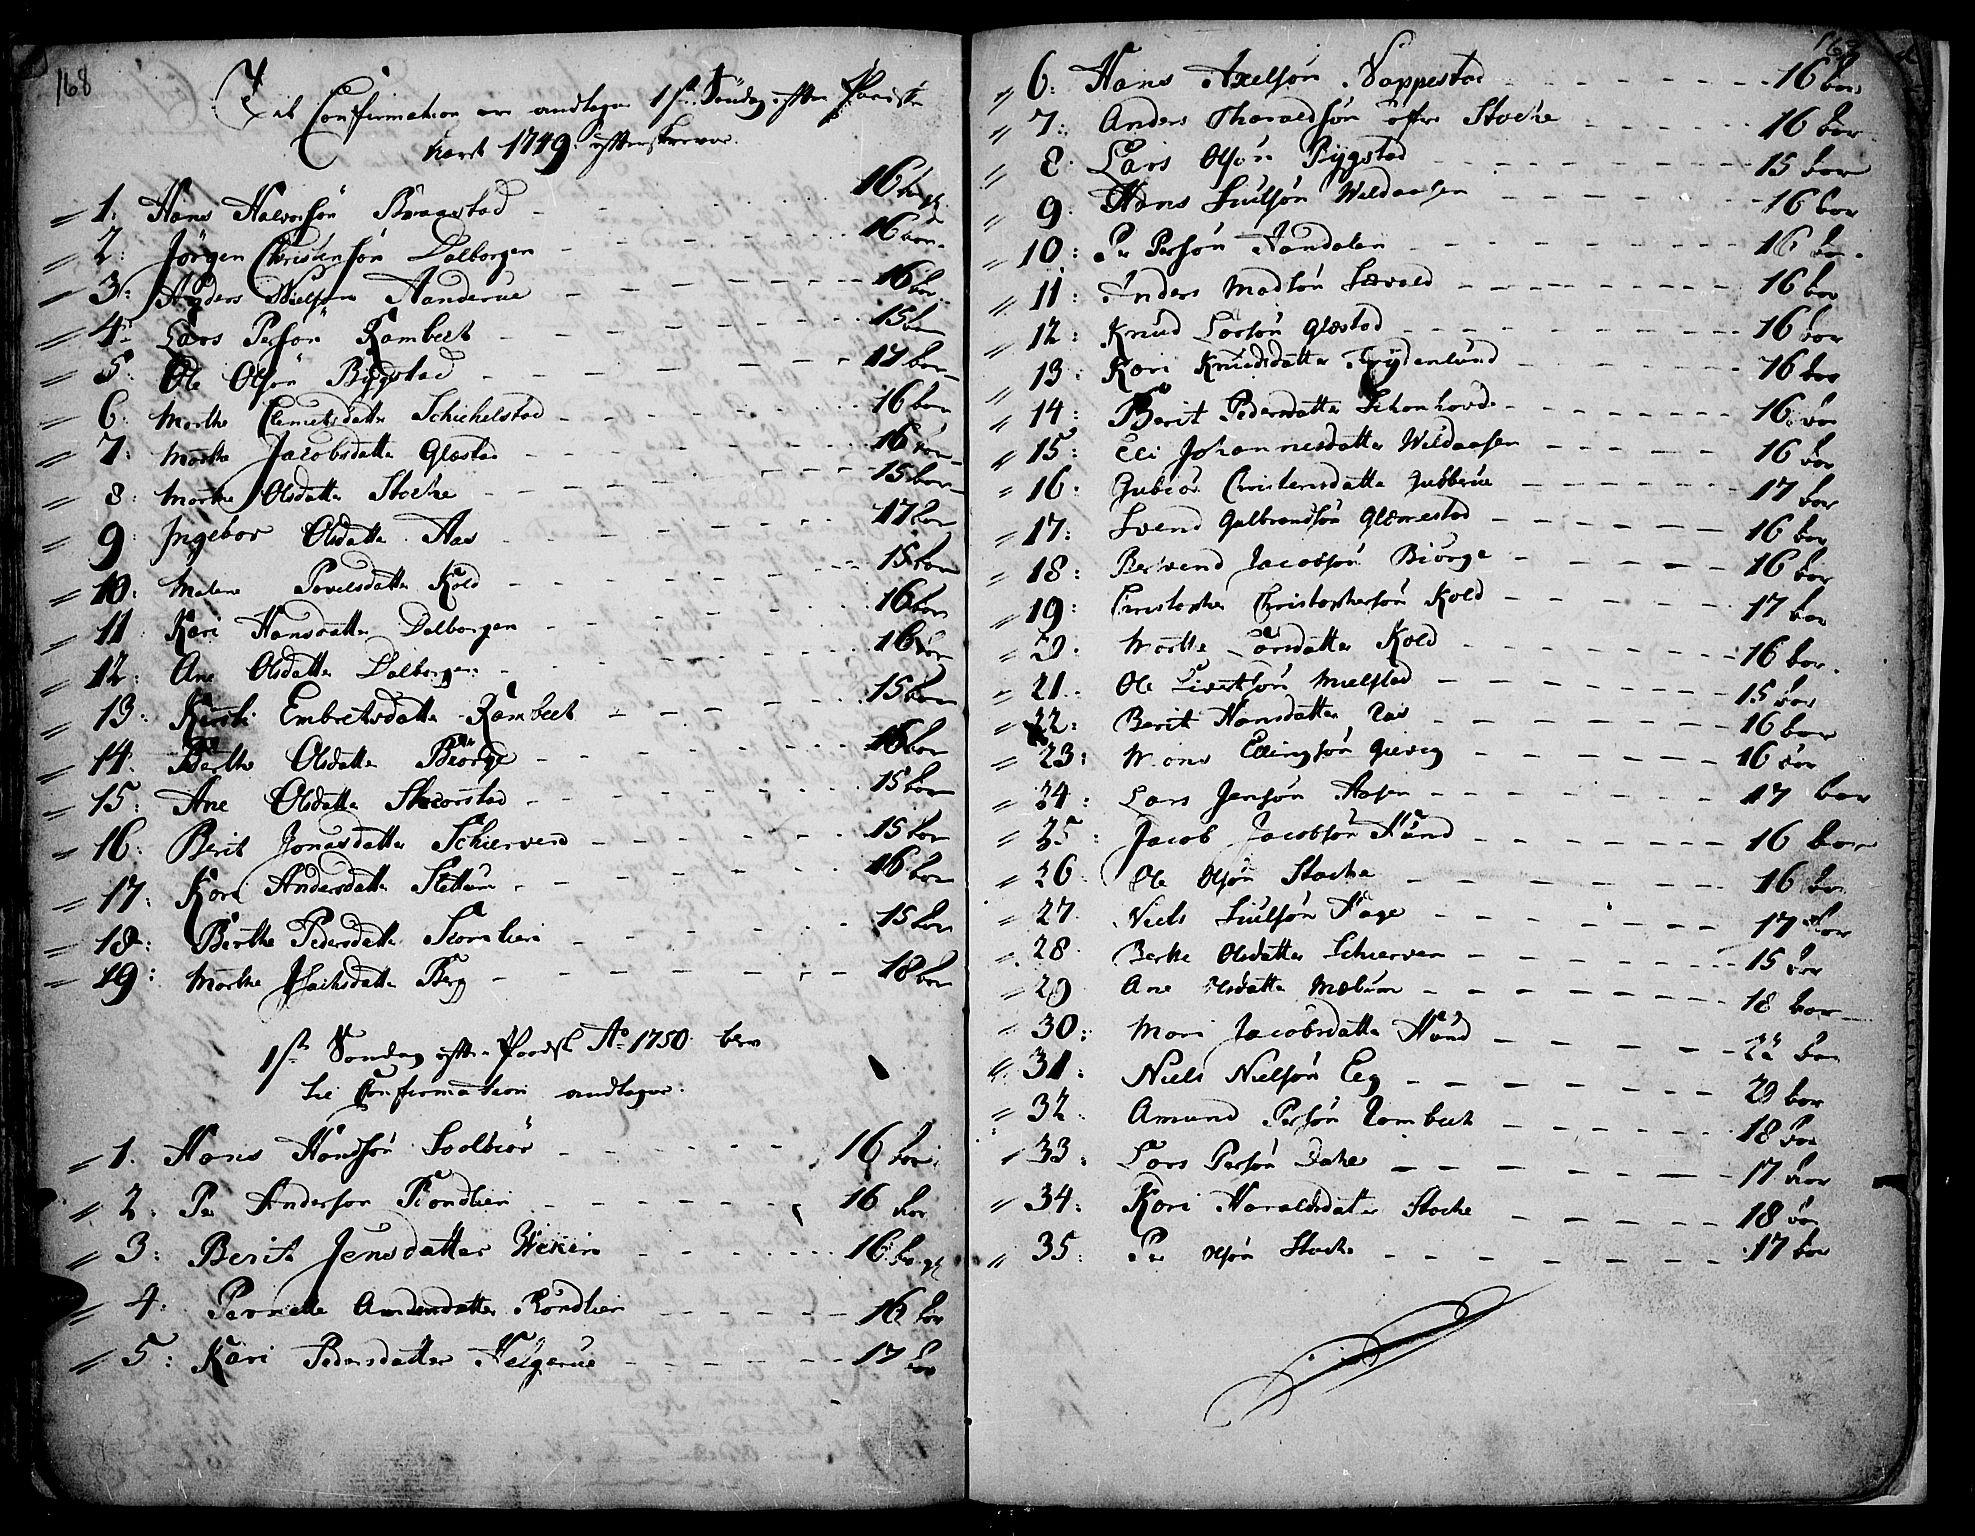 SAH, Vardal prestekontor, H/Ha/Haa/L0002: Ministerialbok nr. 2, 1748-1776, s. 168-169